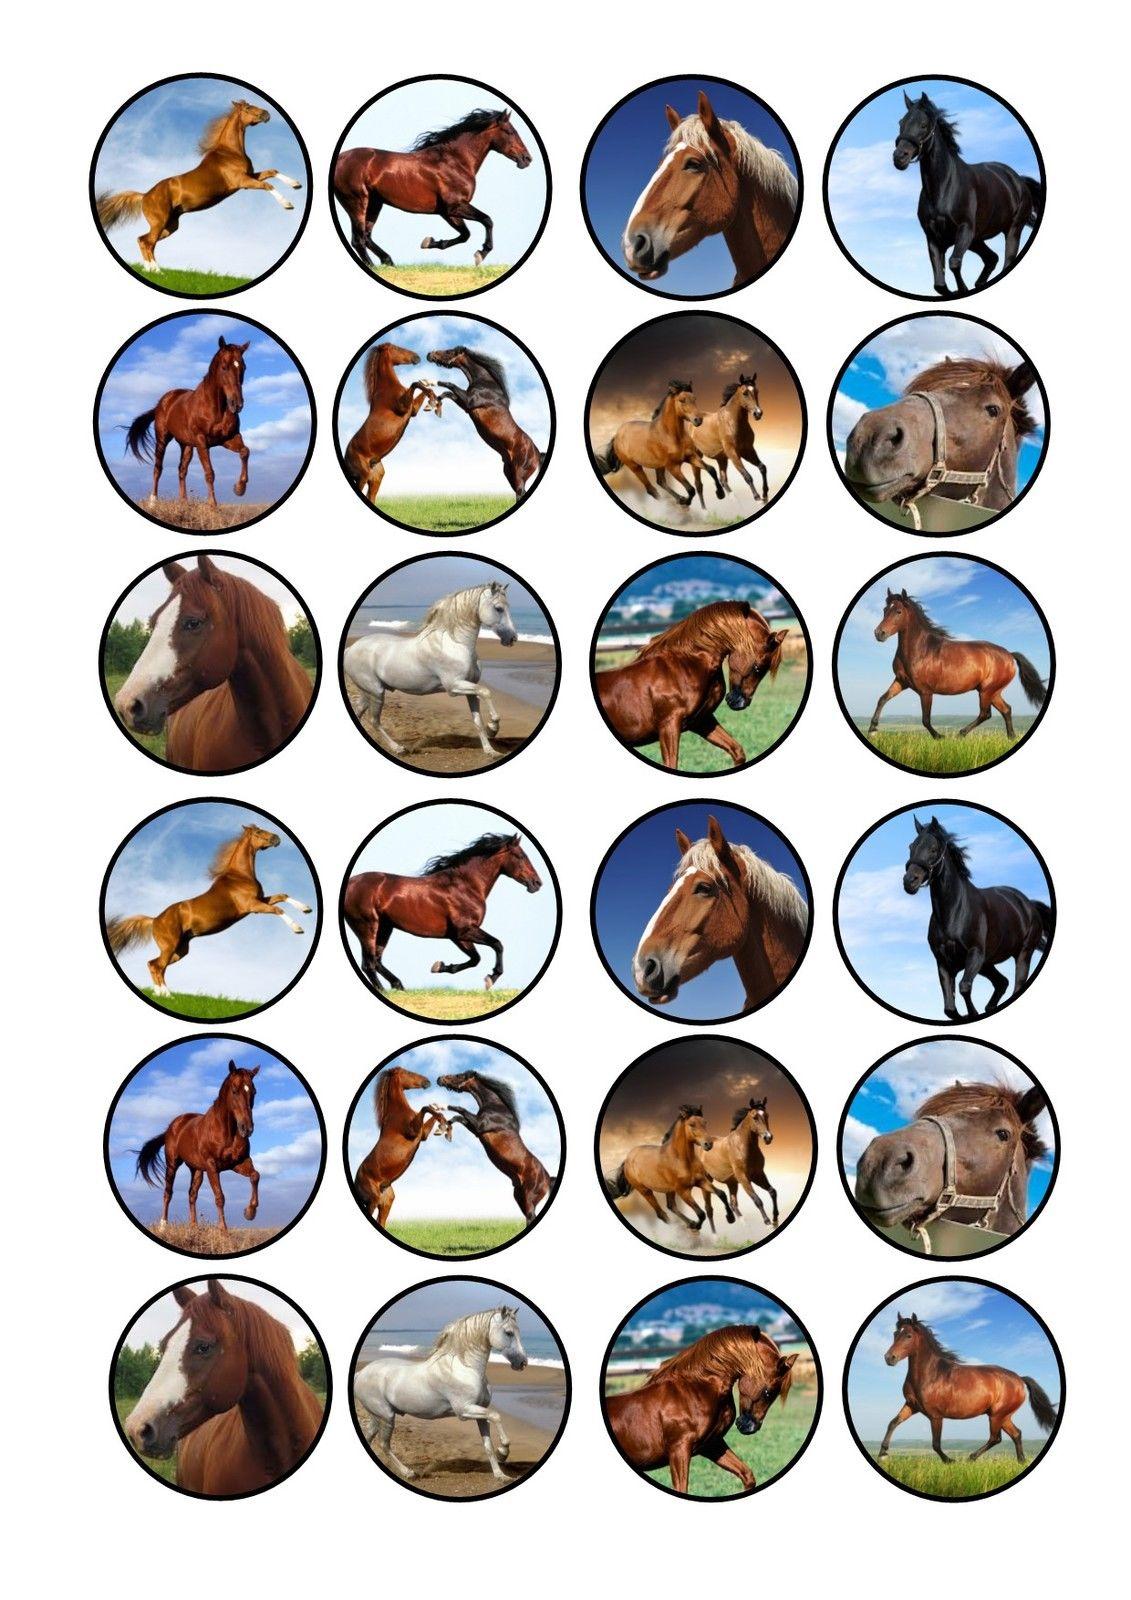 Pony Cupcakes - Topcake Ireland